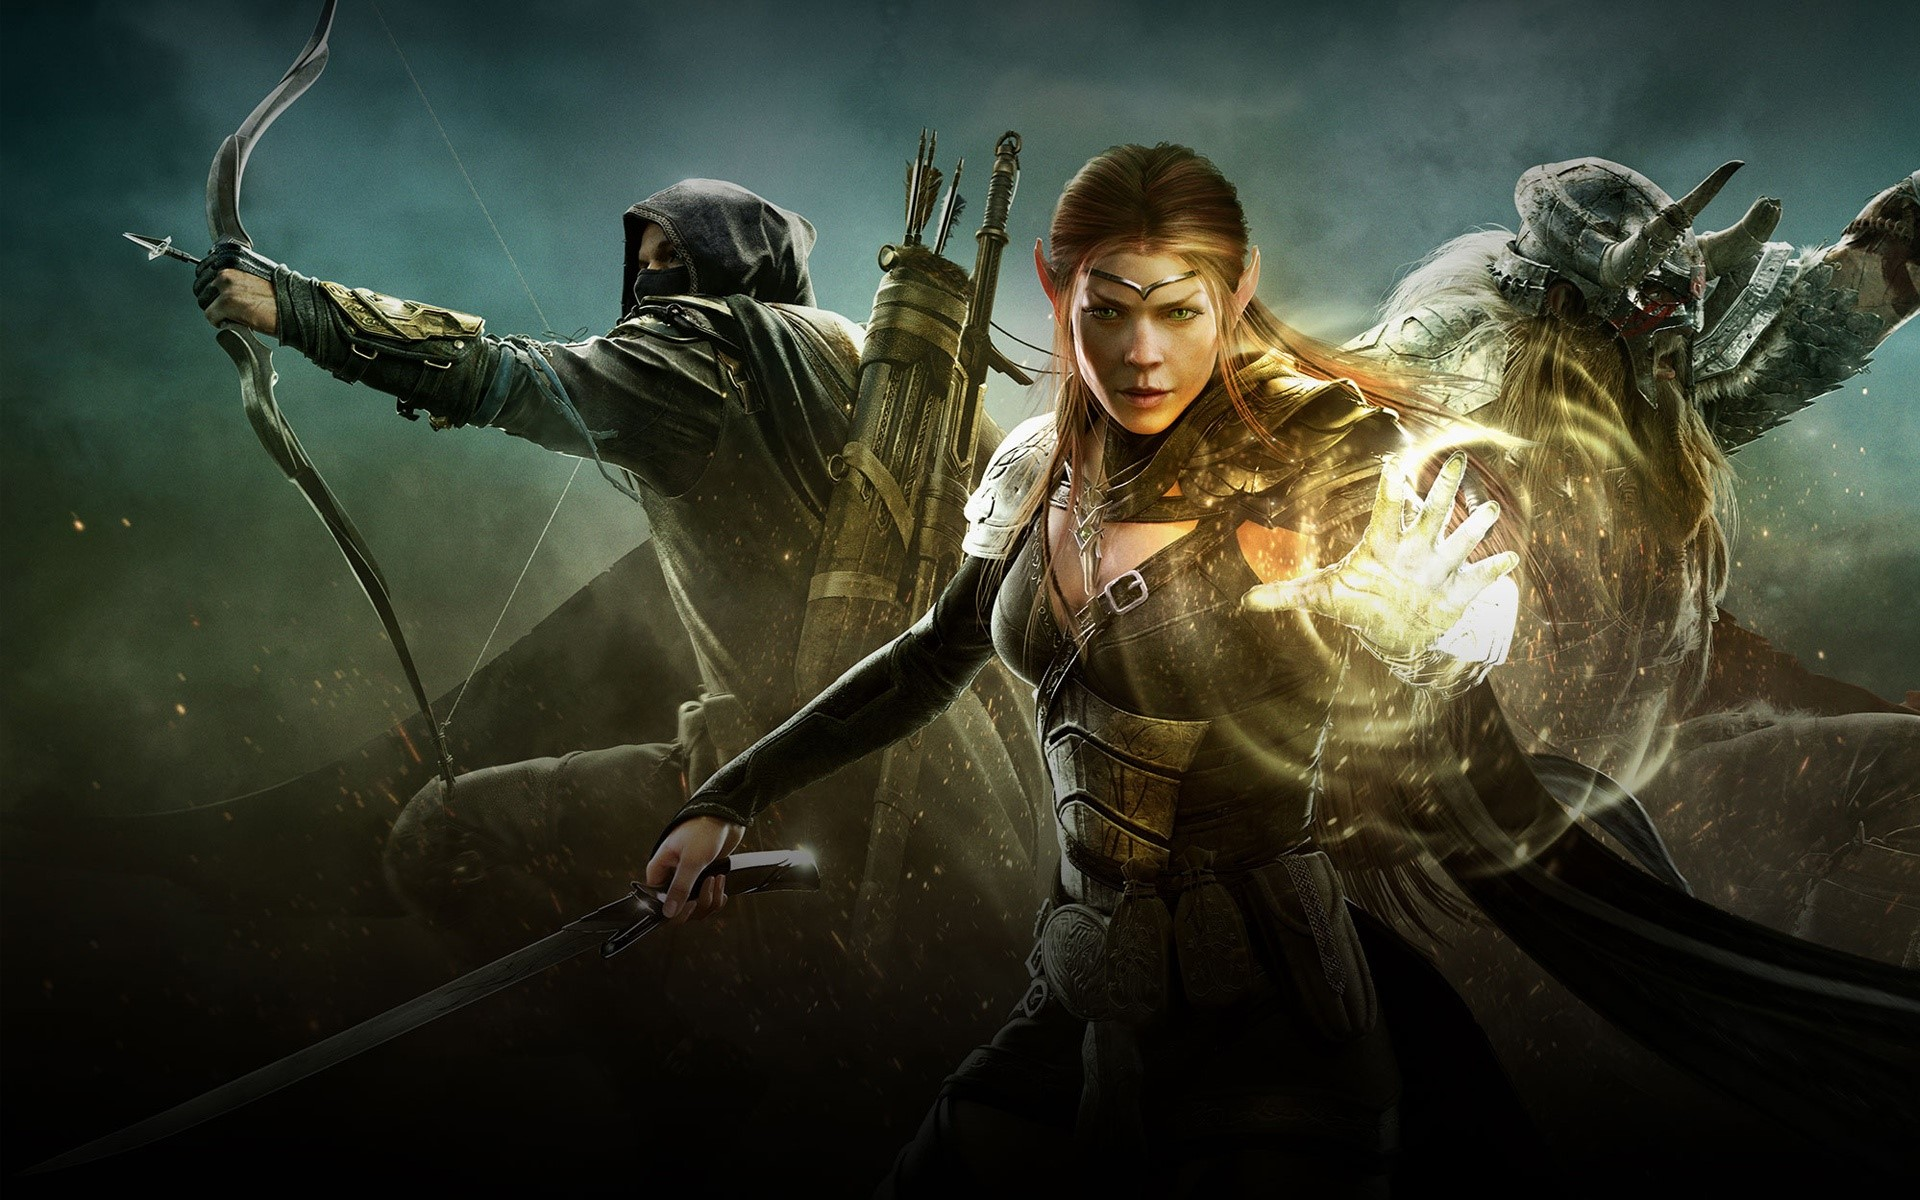 Fondos de pantalla The Elder Scrolls Warriors